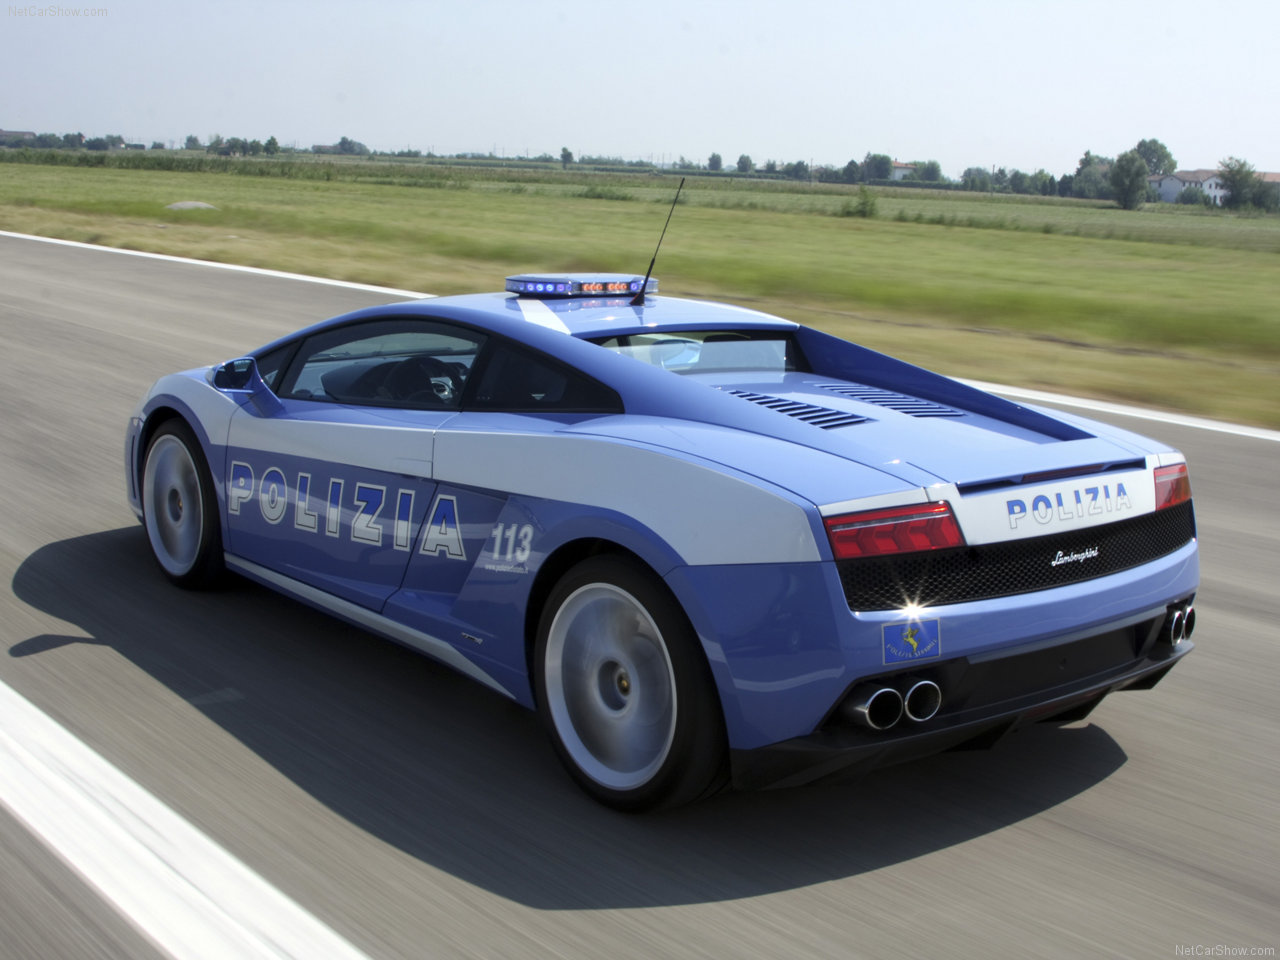 http://4.bp.blogspot.com/-p9hH05_1OgU/TY8oOPousmI/AAAAAAAAA_M/WVt8kGlrLcs/s1600/Lamborghini-Gallardo_LP560-4_Polizia_2009_1280x960_wallpaper_07.jpg